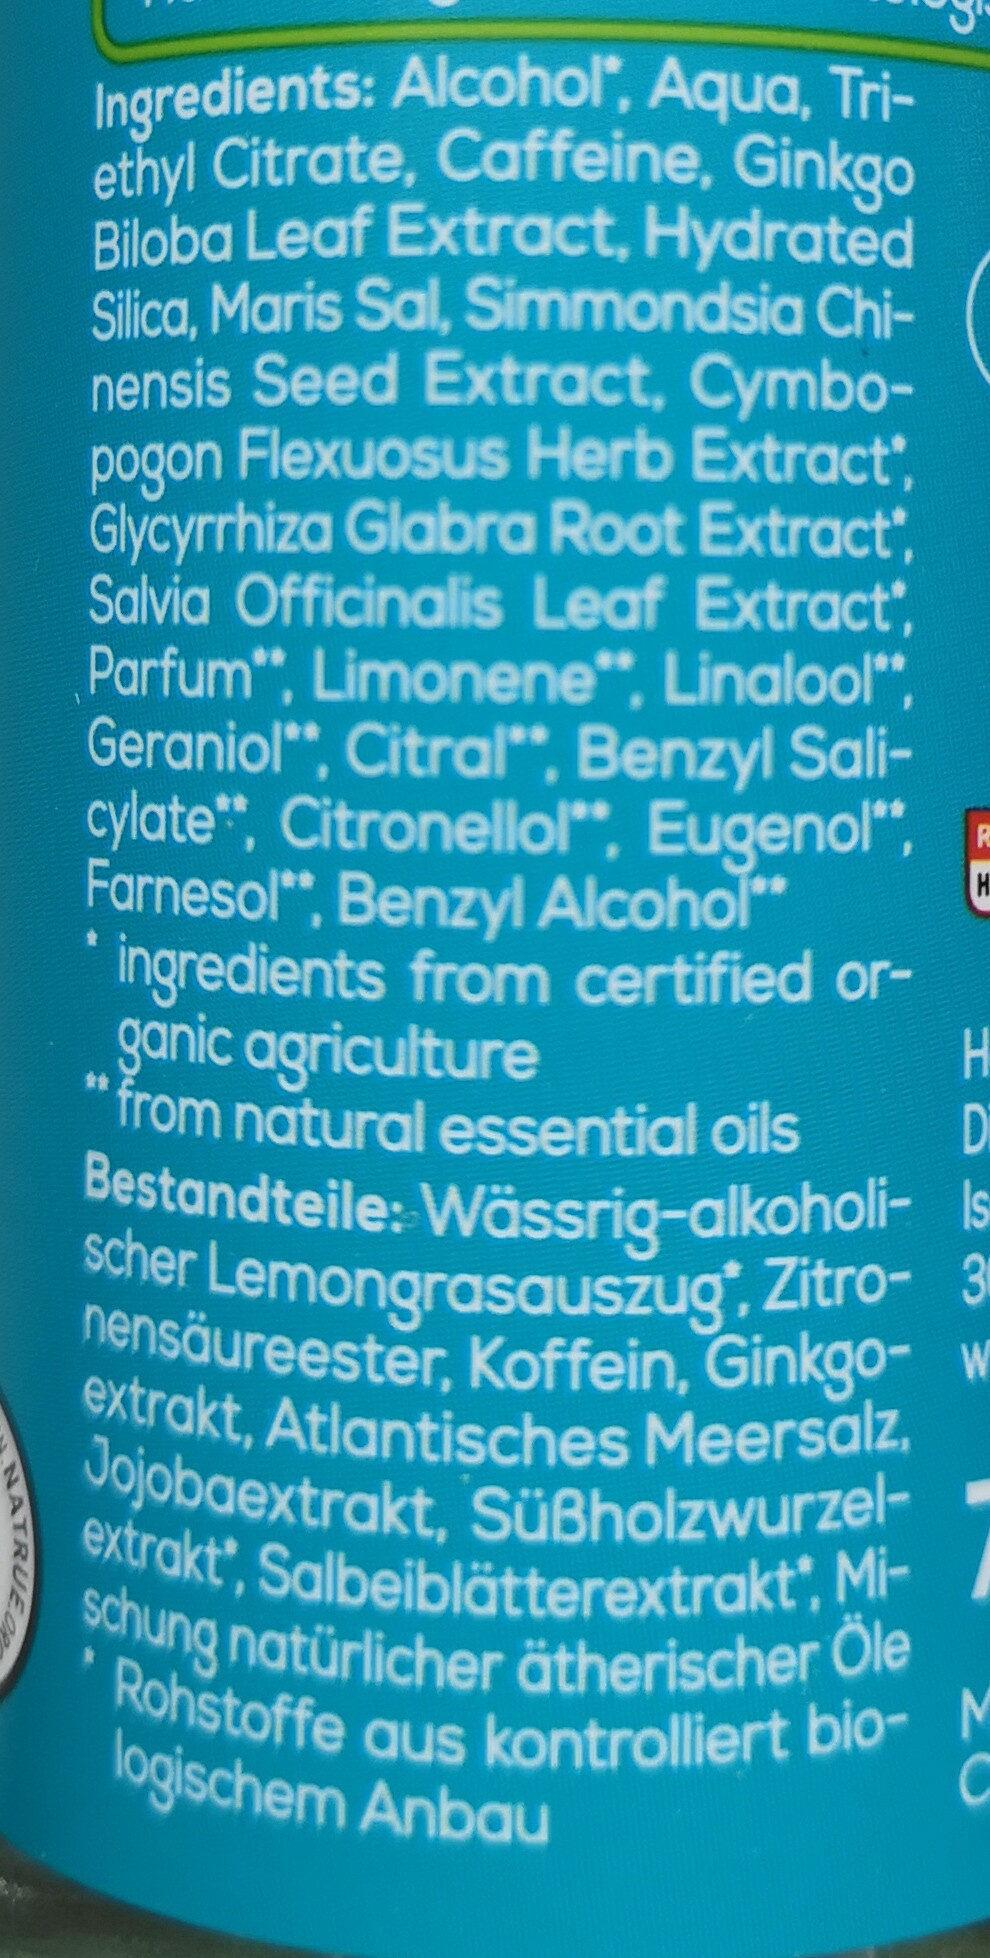 Sport Deo-Spray Bio-Lemongras, Koffein - Ingredients - de